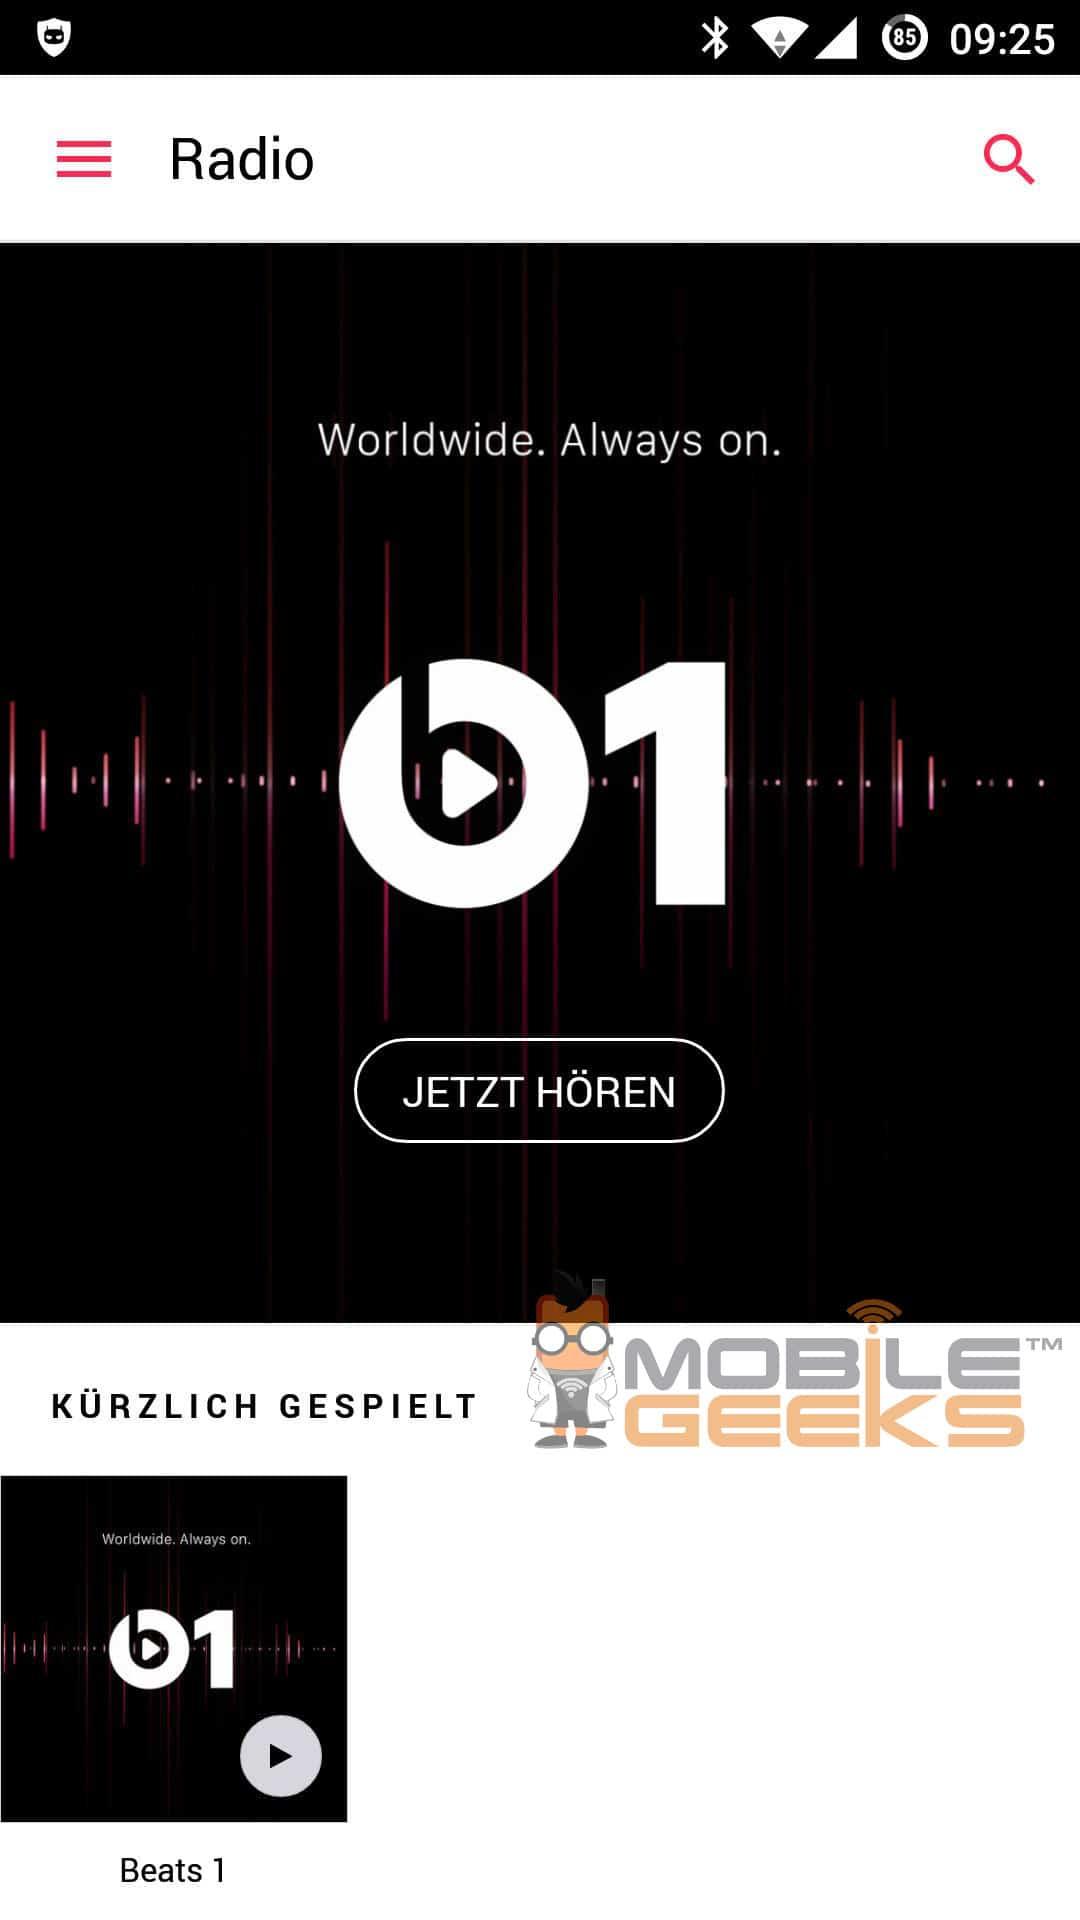 Apple Music Android 1 KK